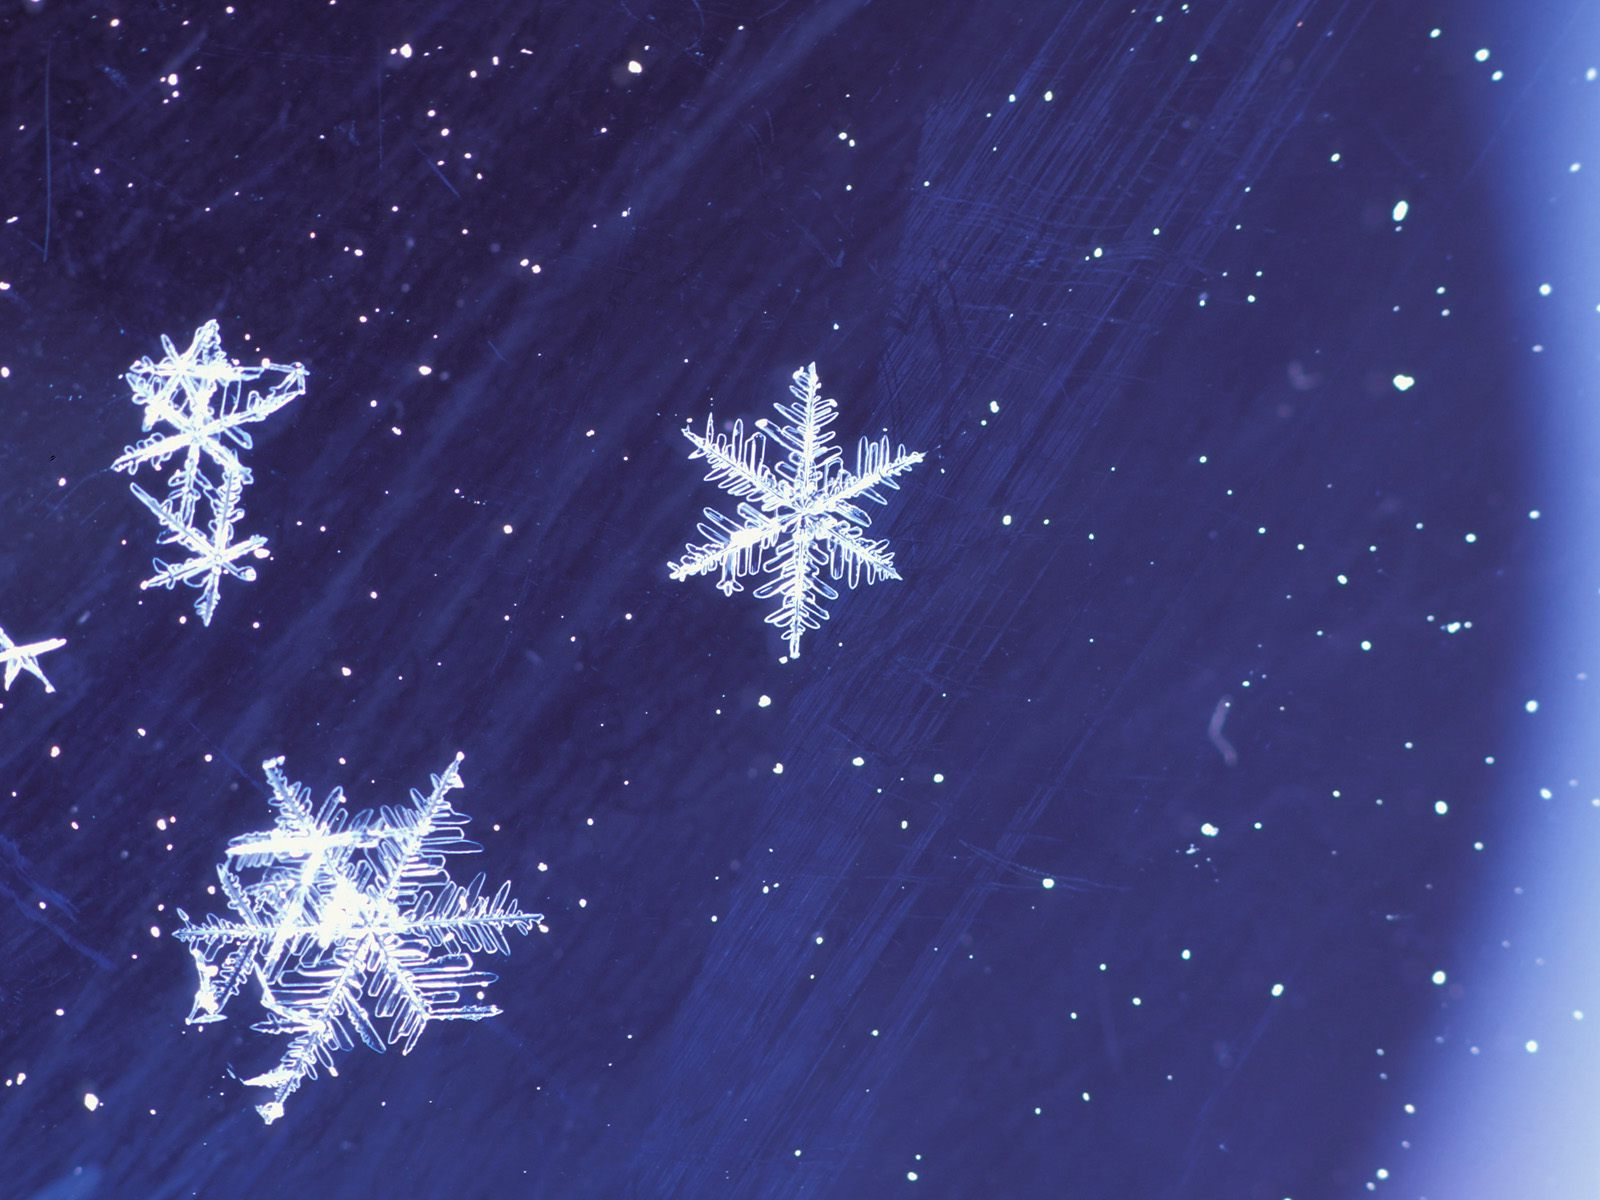 Smiley Full Hd Wallpaper And Achtergrond: Mooie Sneeuw Achtergronden